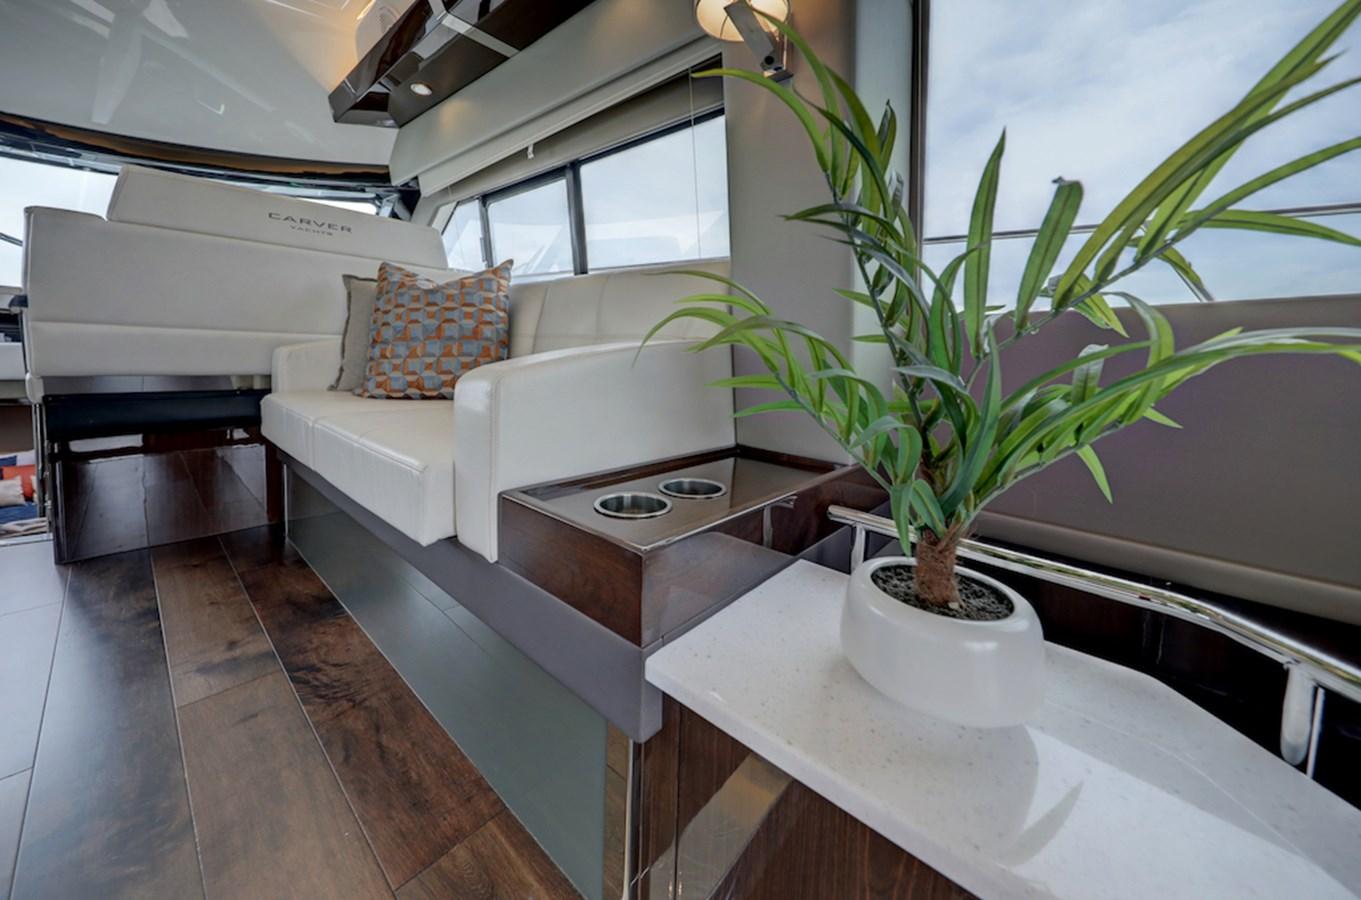 B44A8344_5_6_7_8 - Copy 2020 CARVER  Motor Yacht 2824975